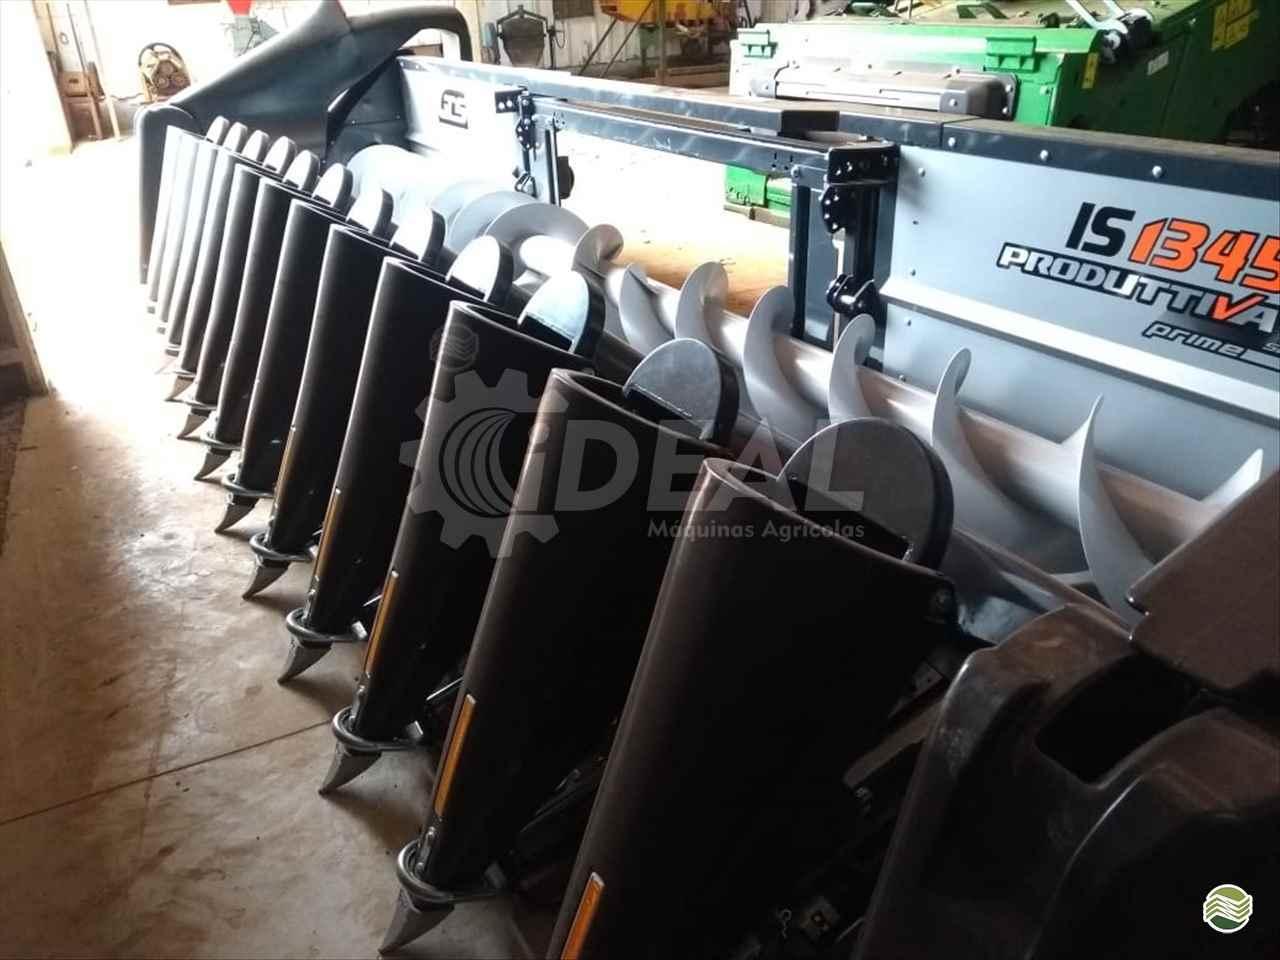 GTS PRODUTTIVA 1345  2020/2020 Ideal Máquinas Agrícolas